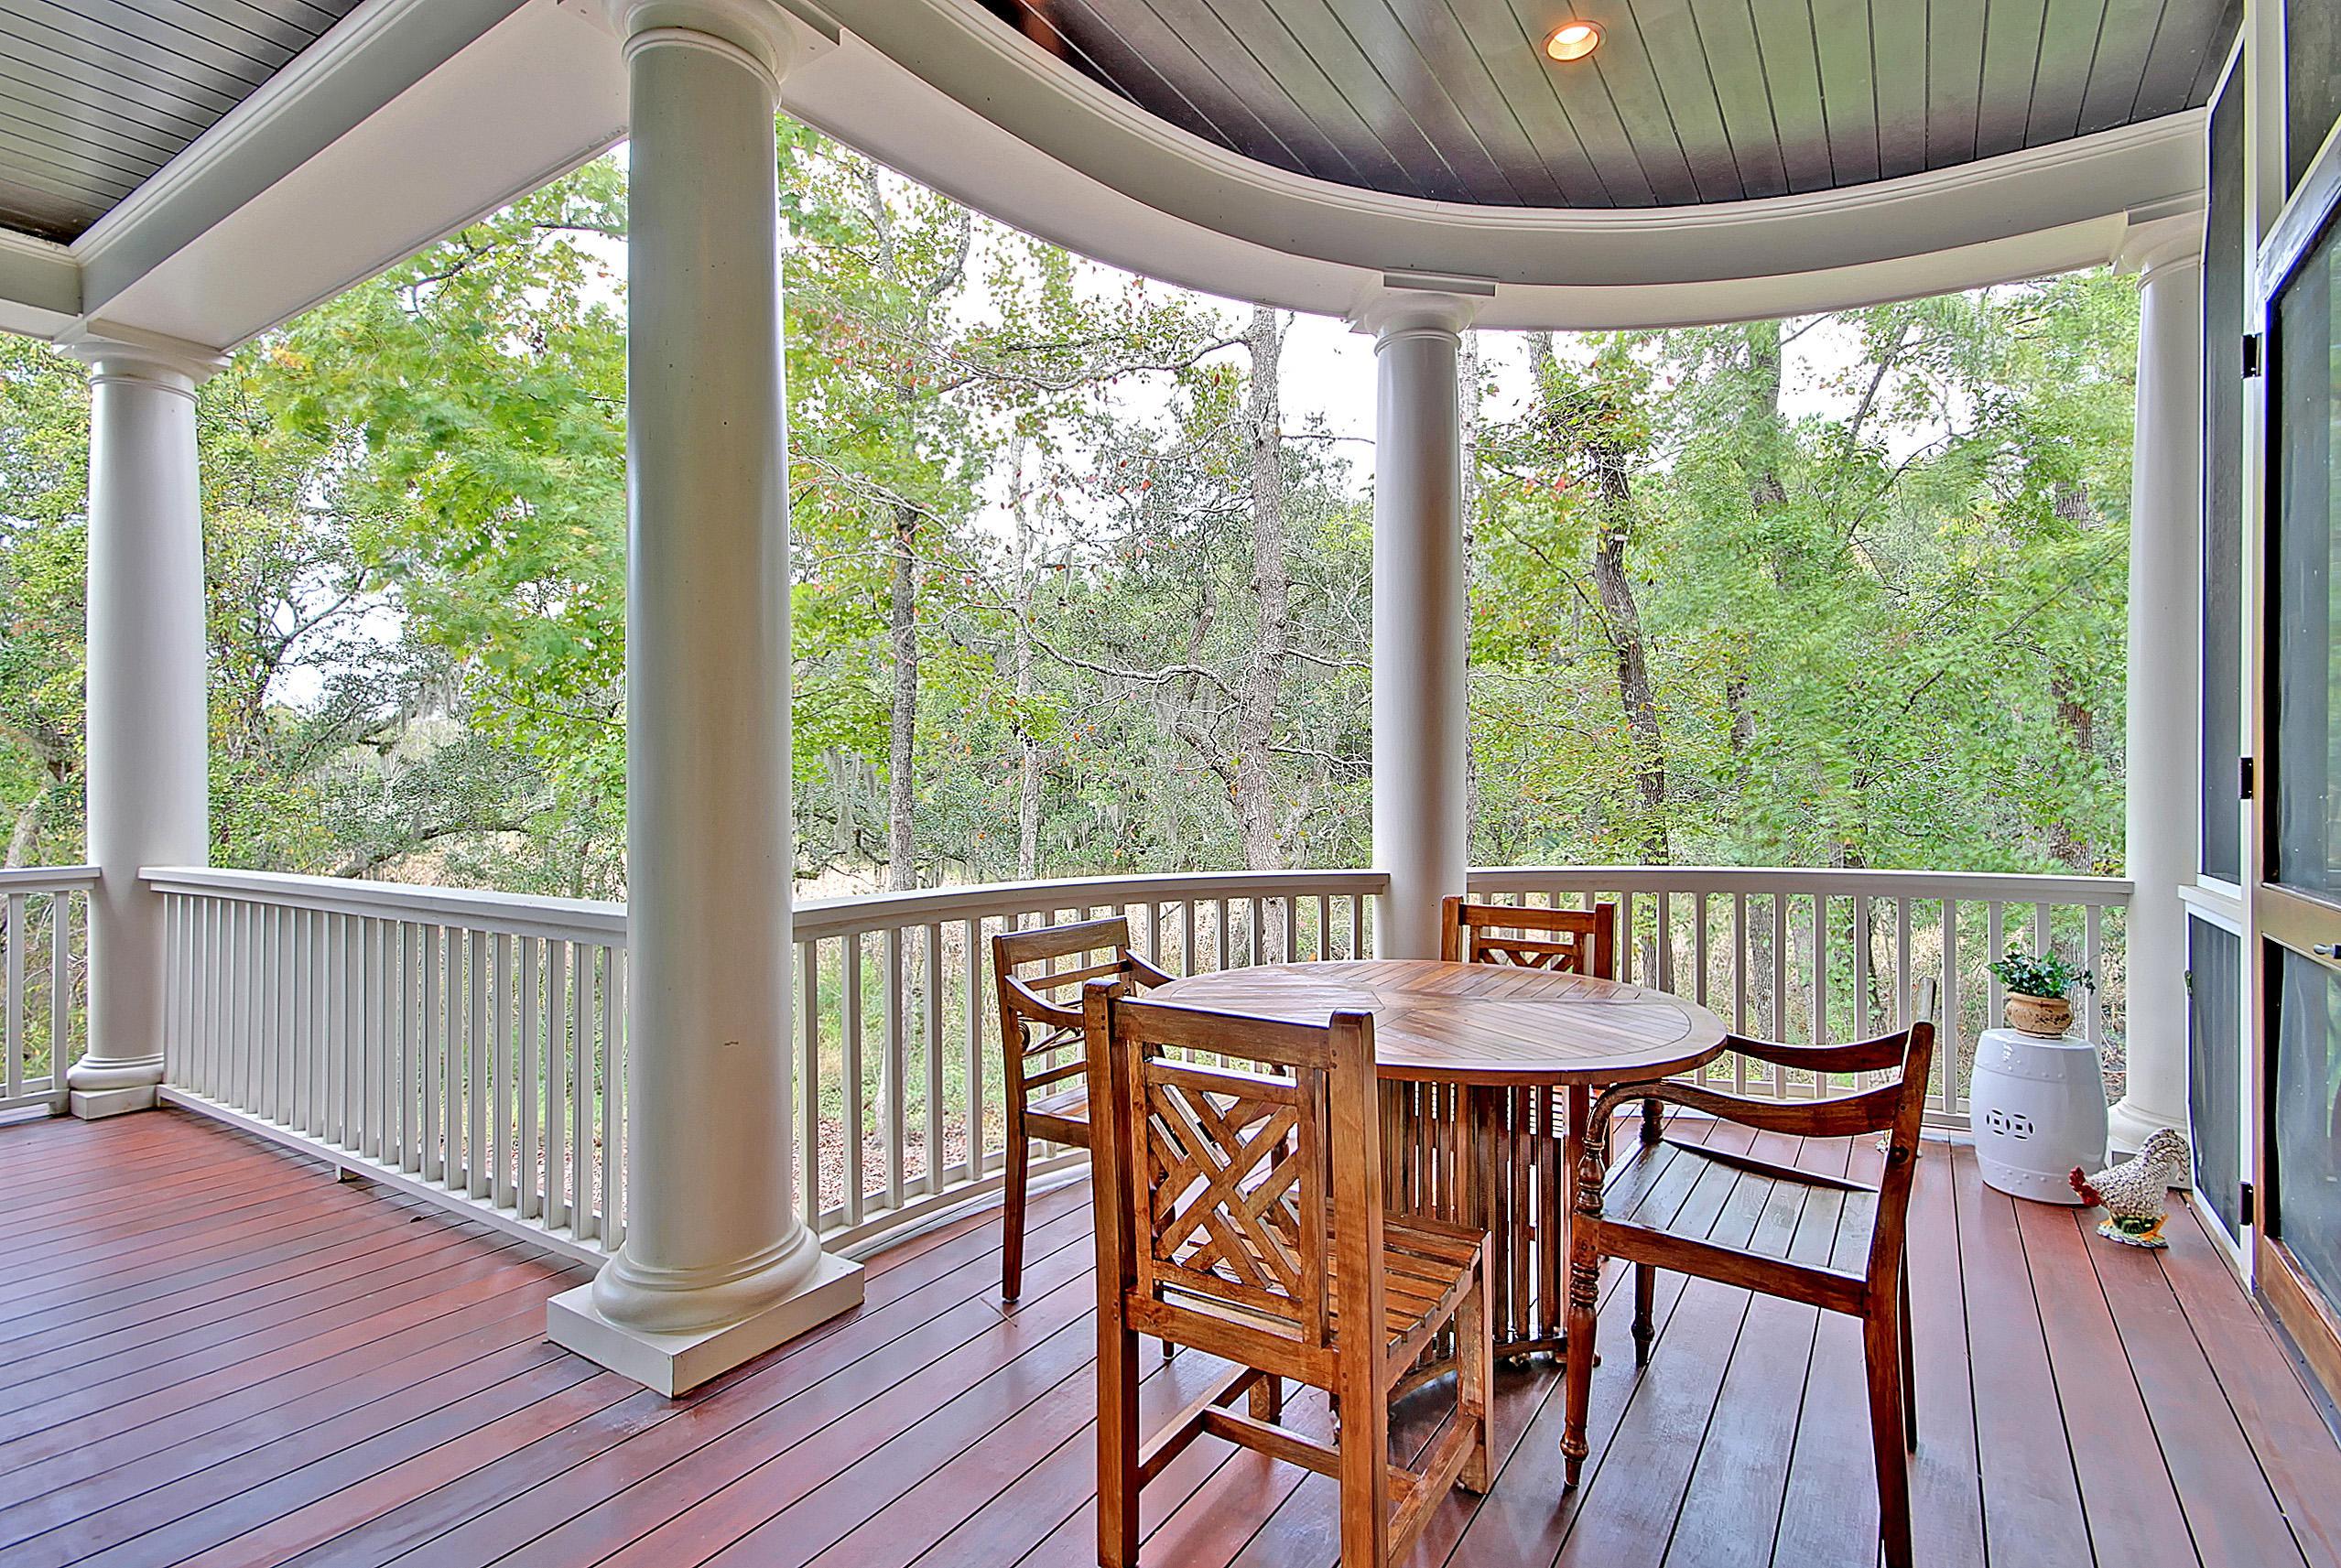 Daniel Island Homes For Sale - 1136 Oak Overhang, Daniel Island, SC - 8